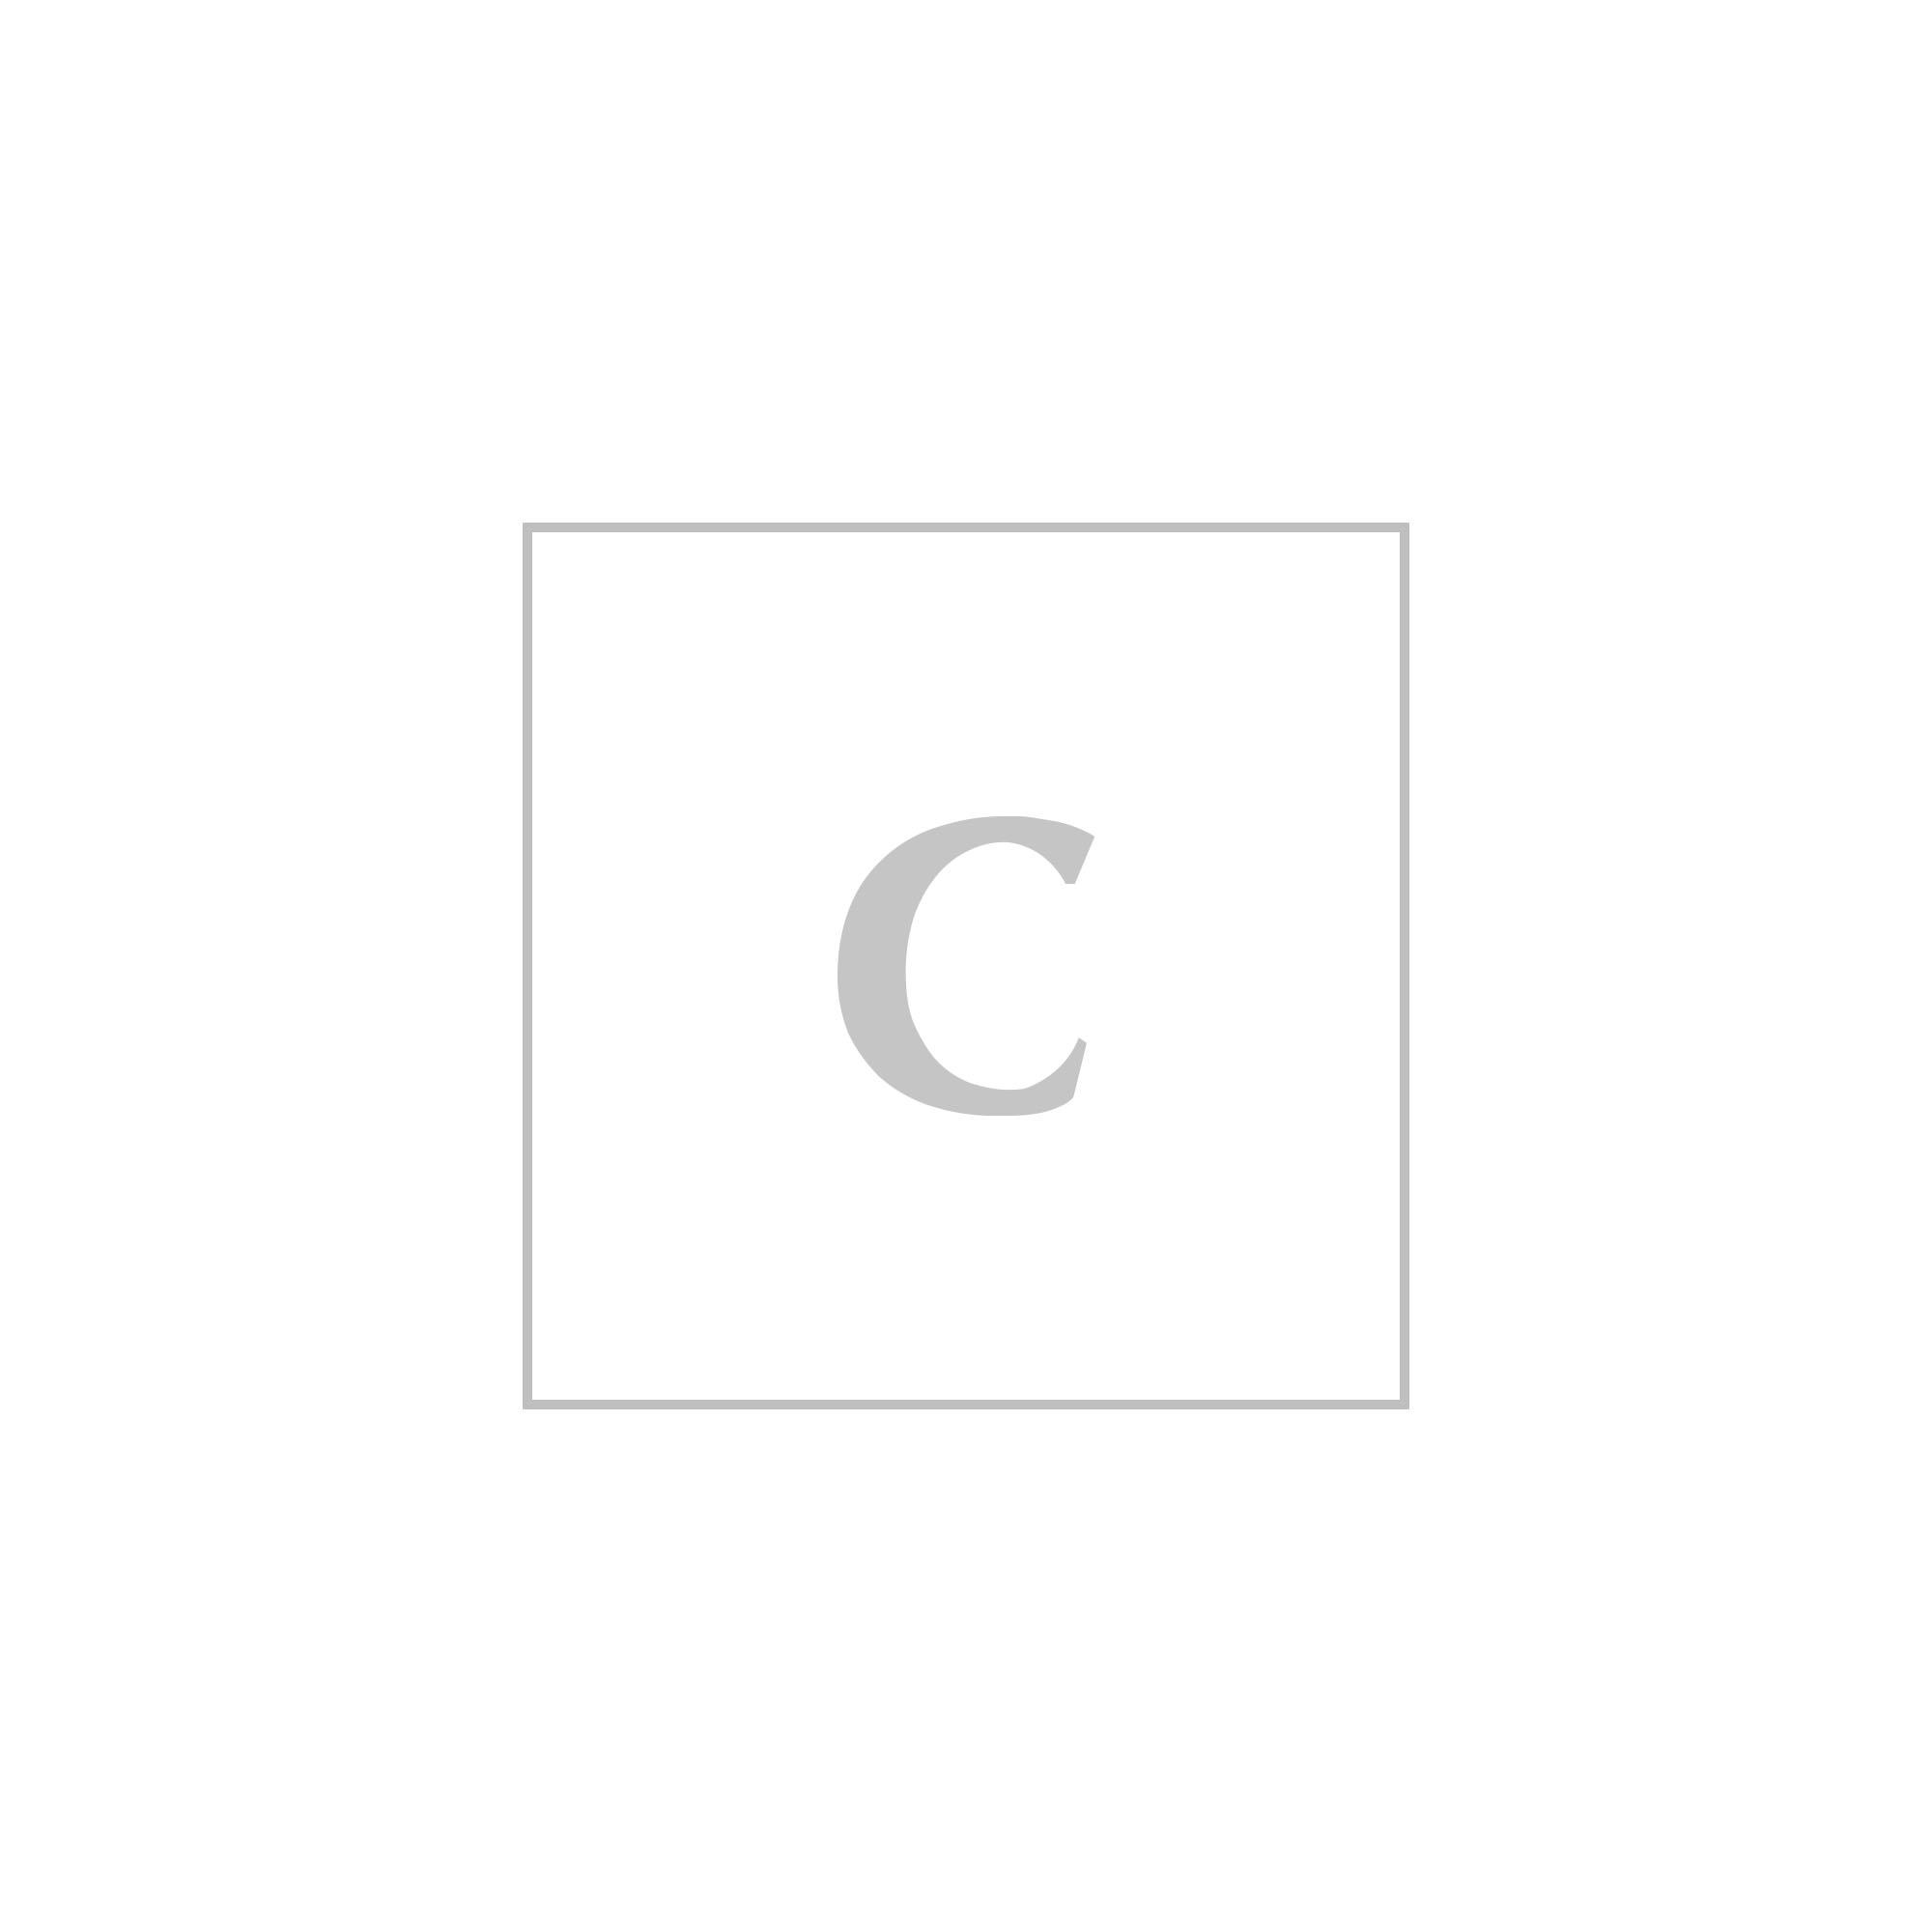 Christian Dior decollete' dior texture